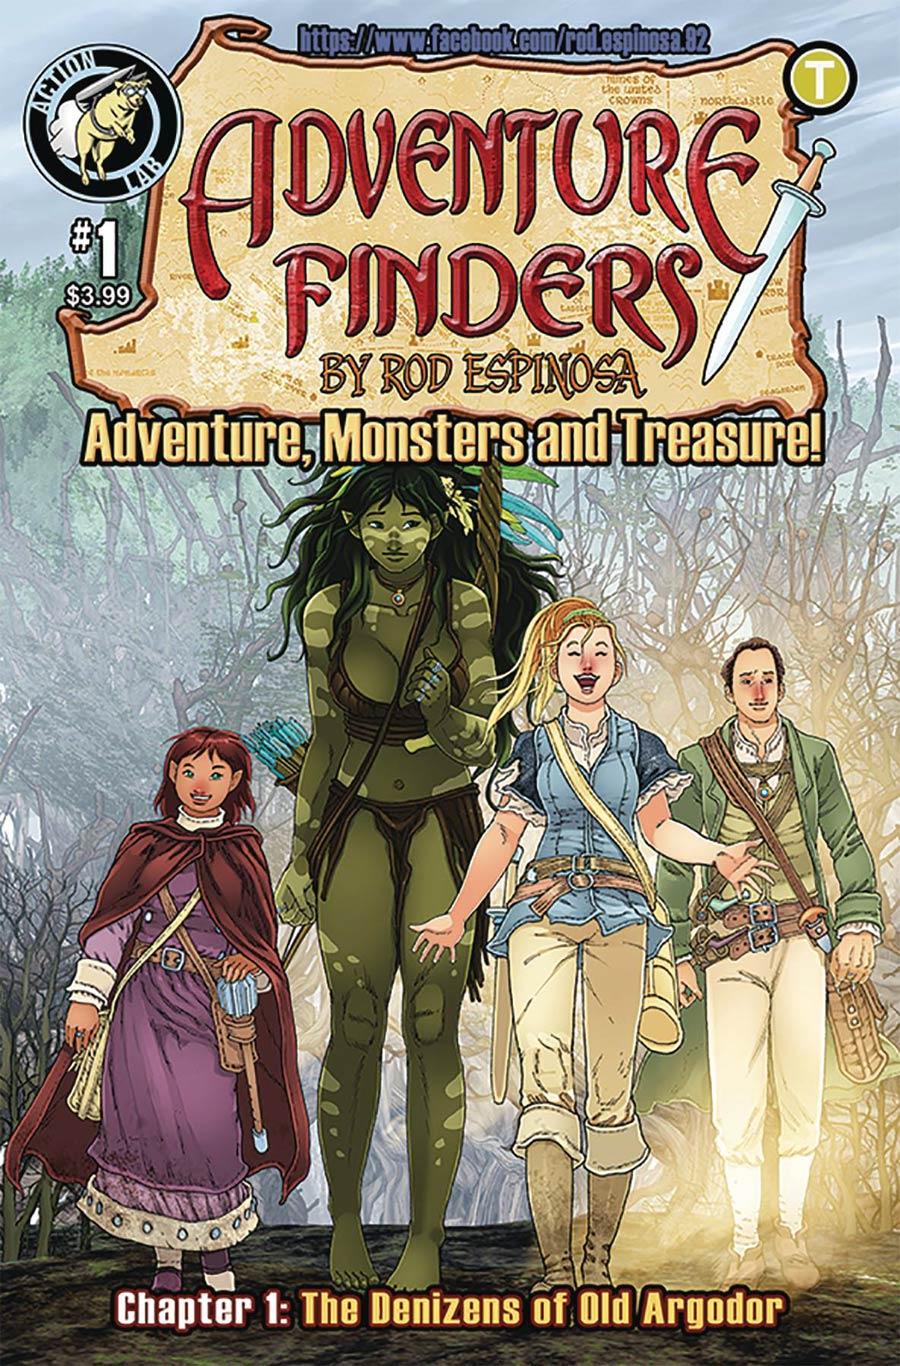 Adventure Finders Vol 3 #1